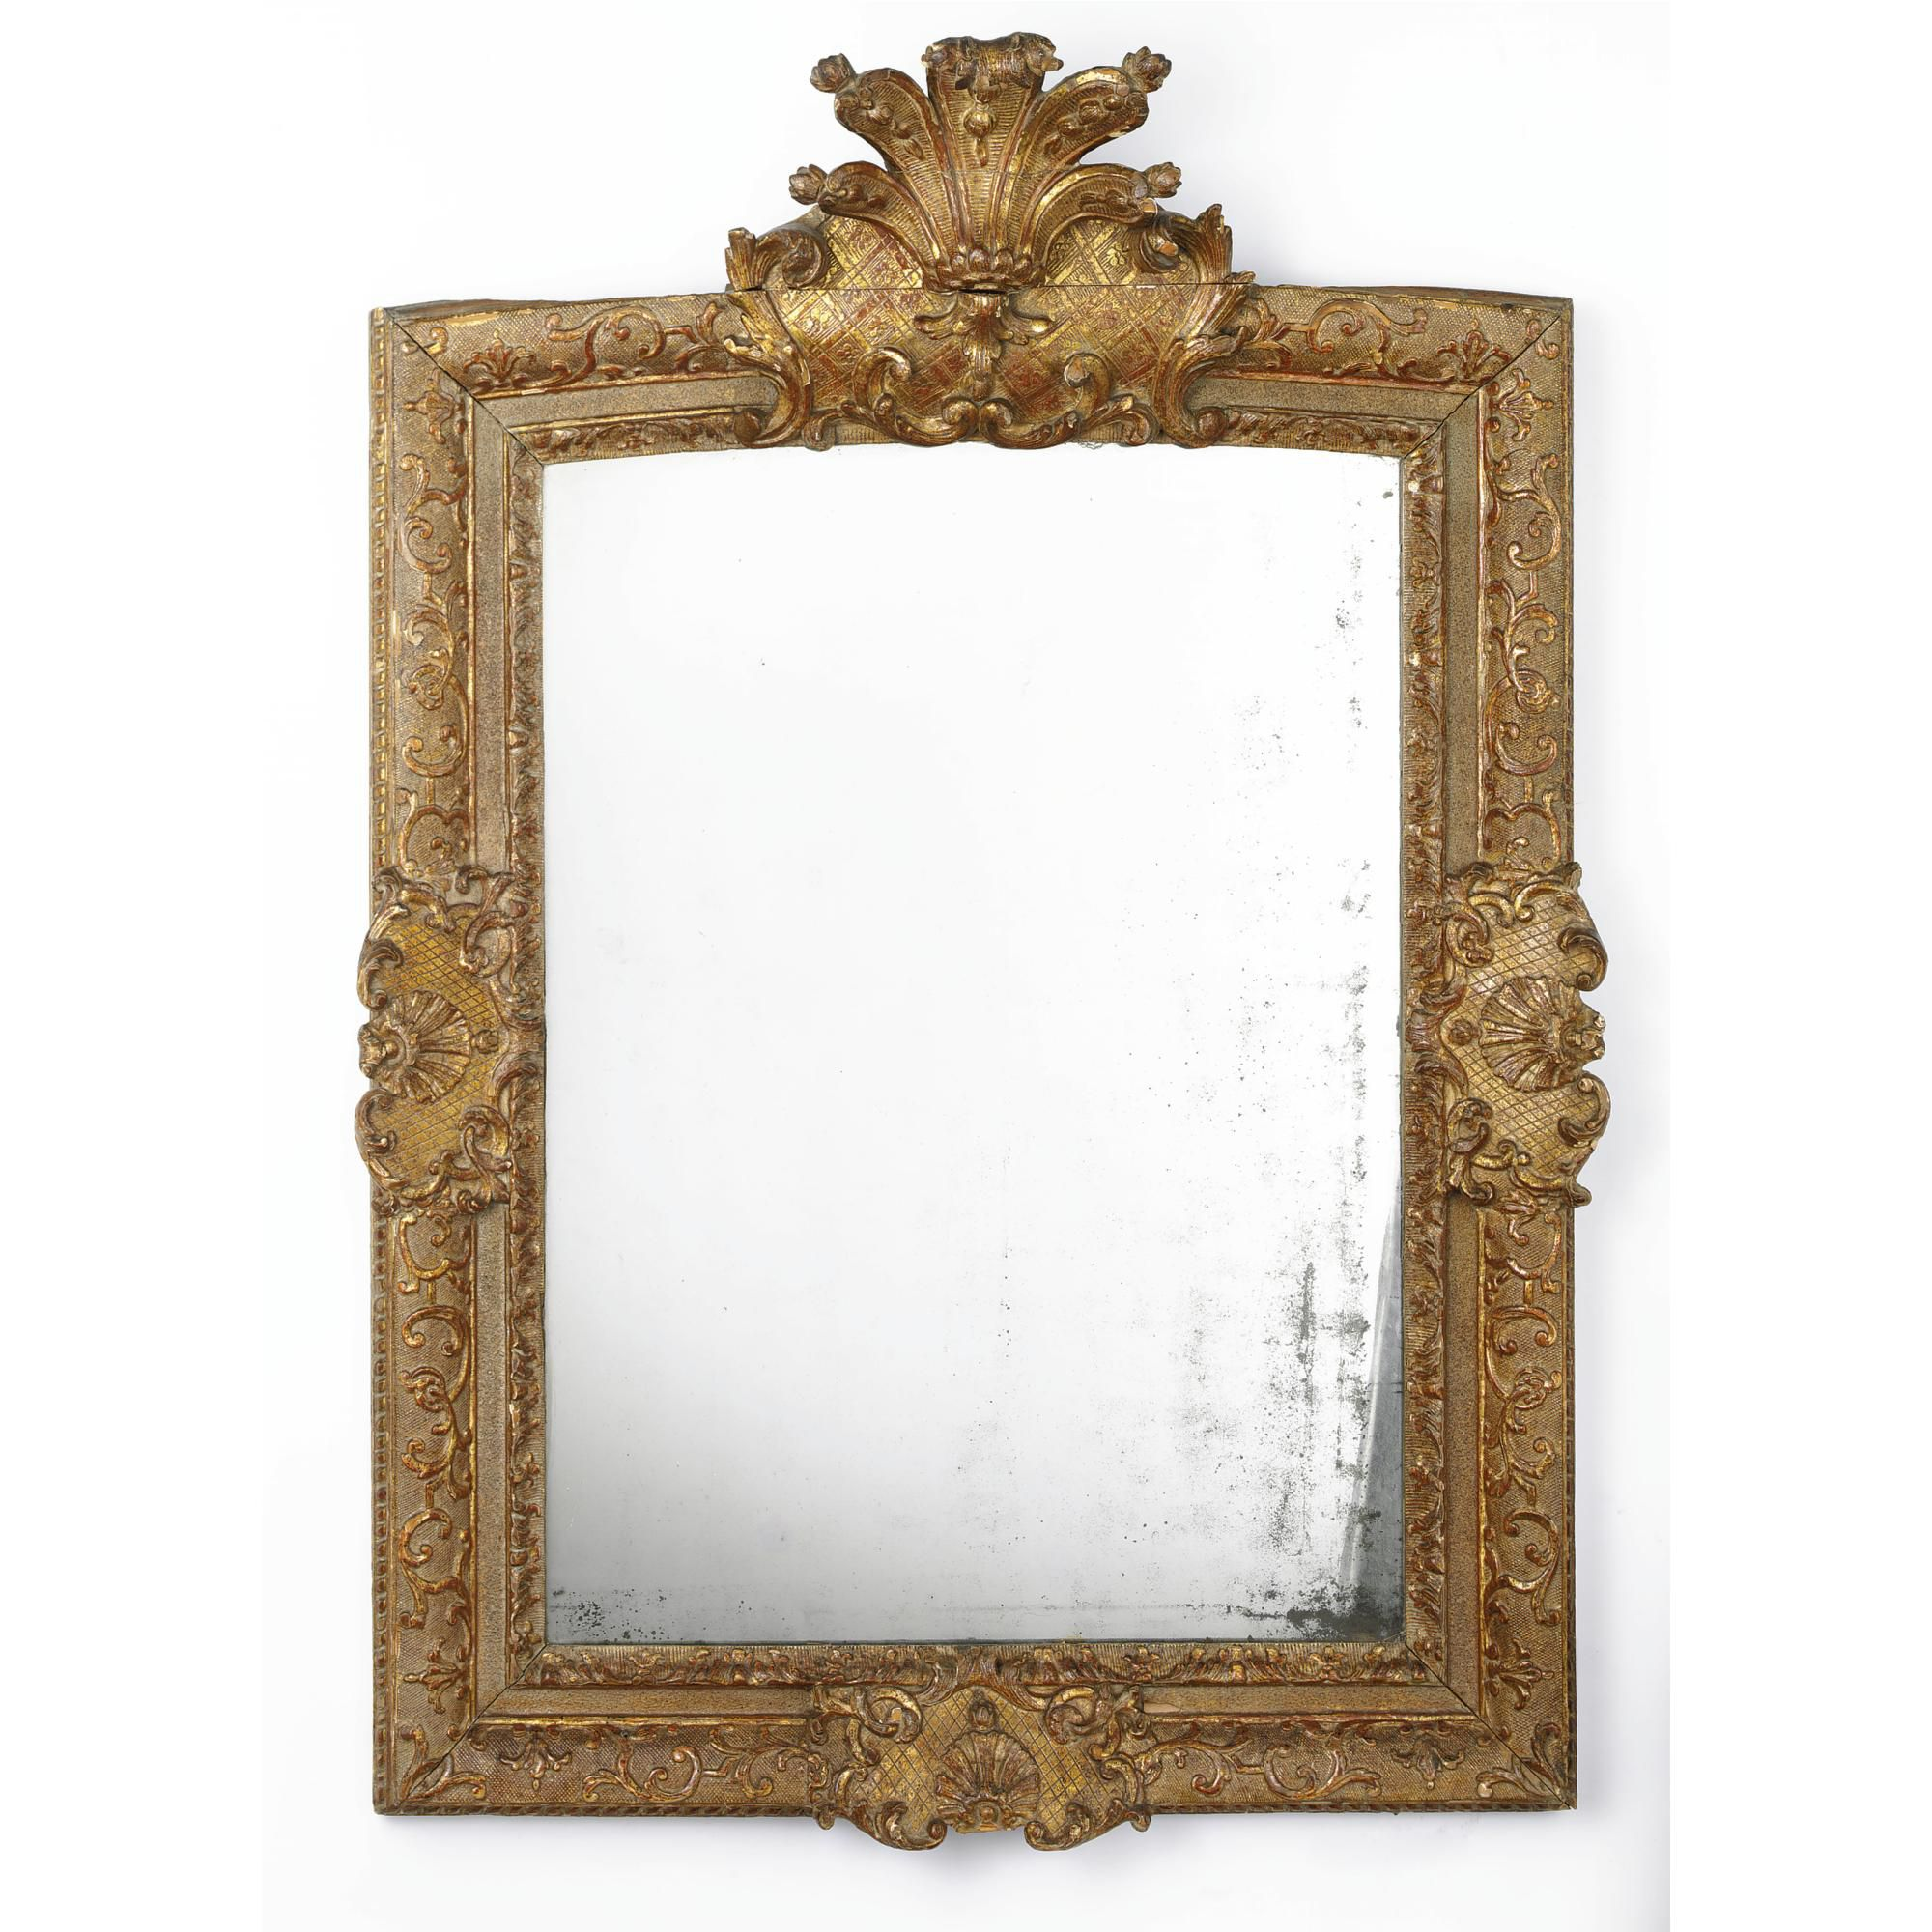 A Régence giltwood mirror first quarter 18th century the rectangular ...